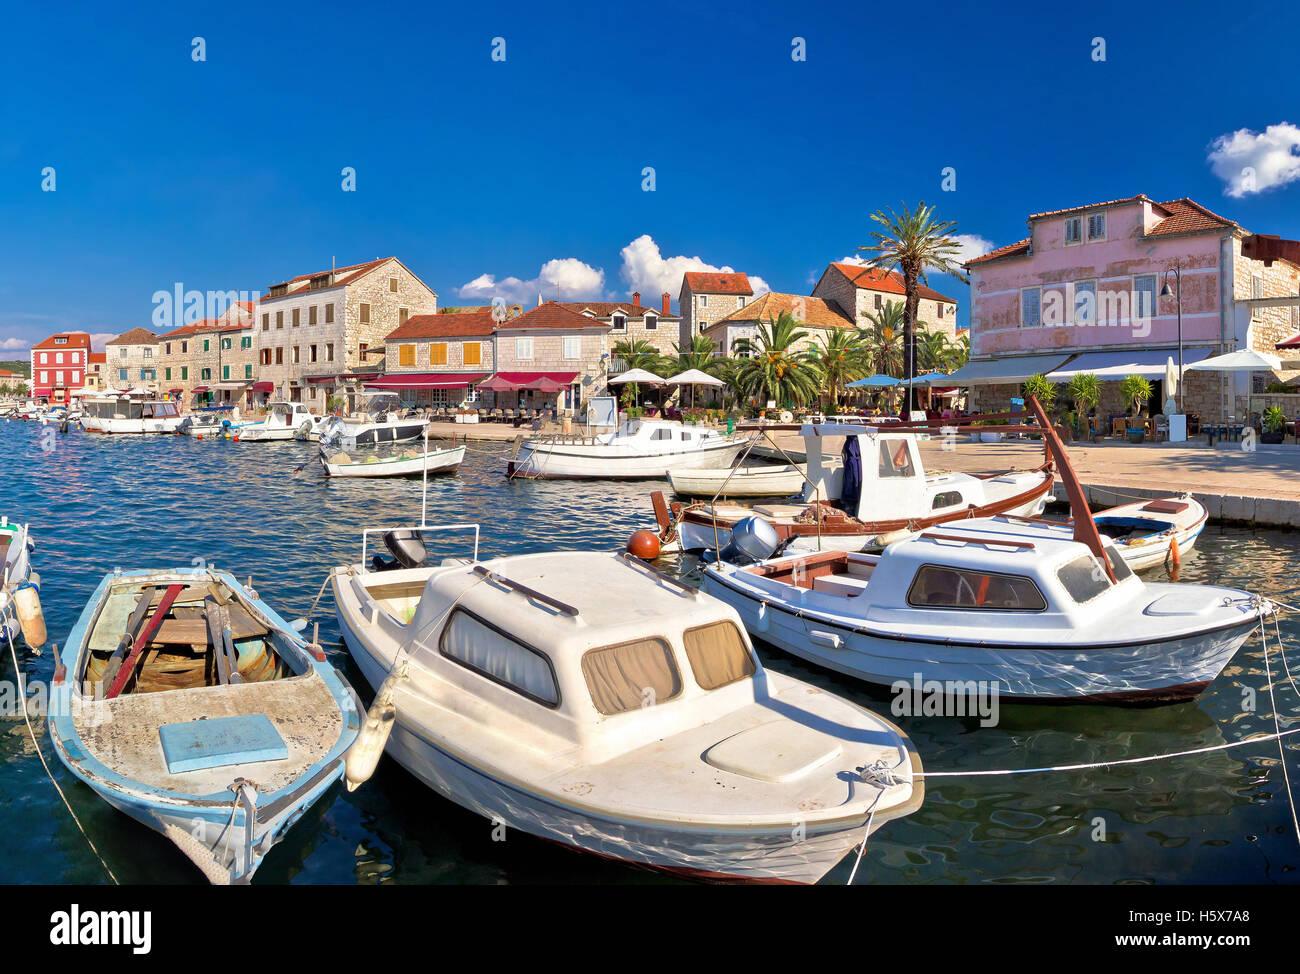 Stari Grad waterfront summer view panorama, island of Hvar, Croatia Stock Photo